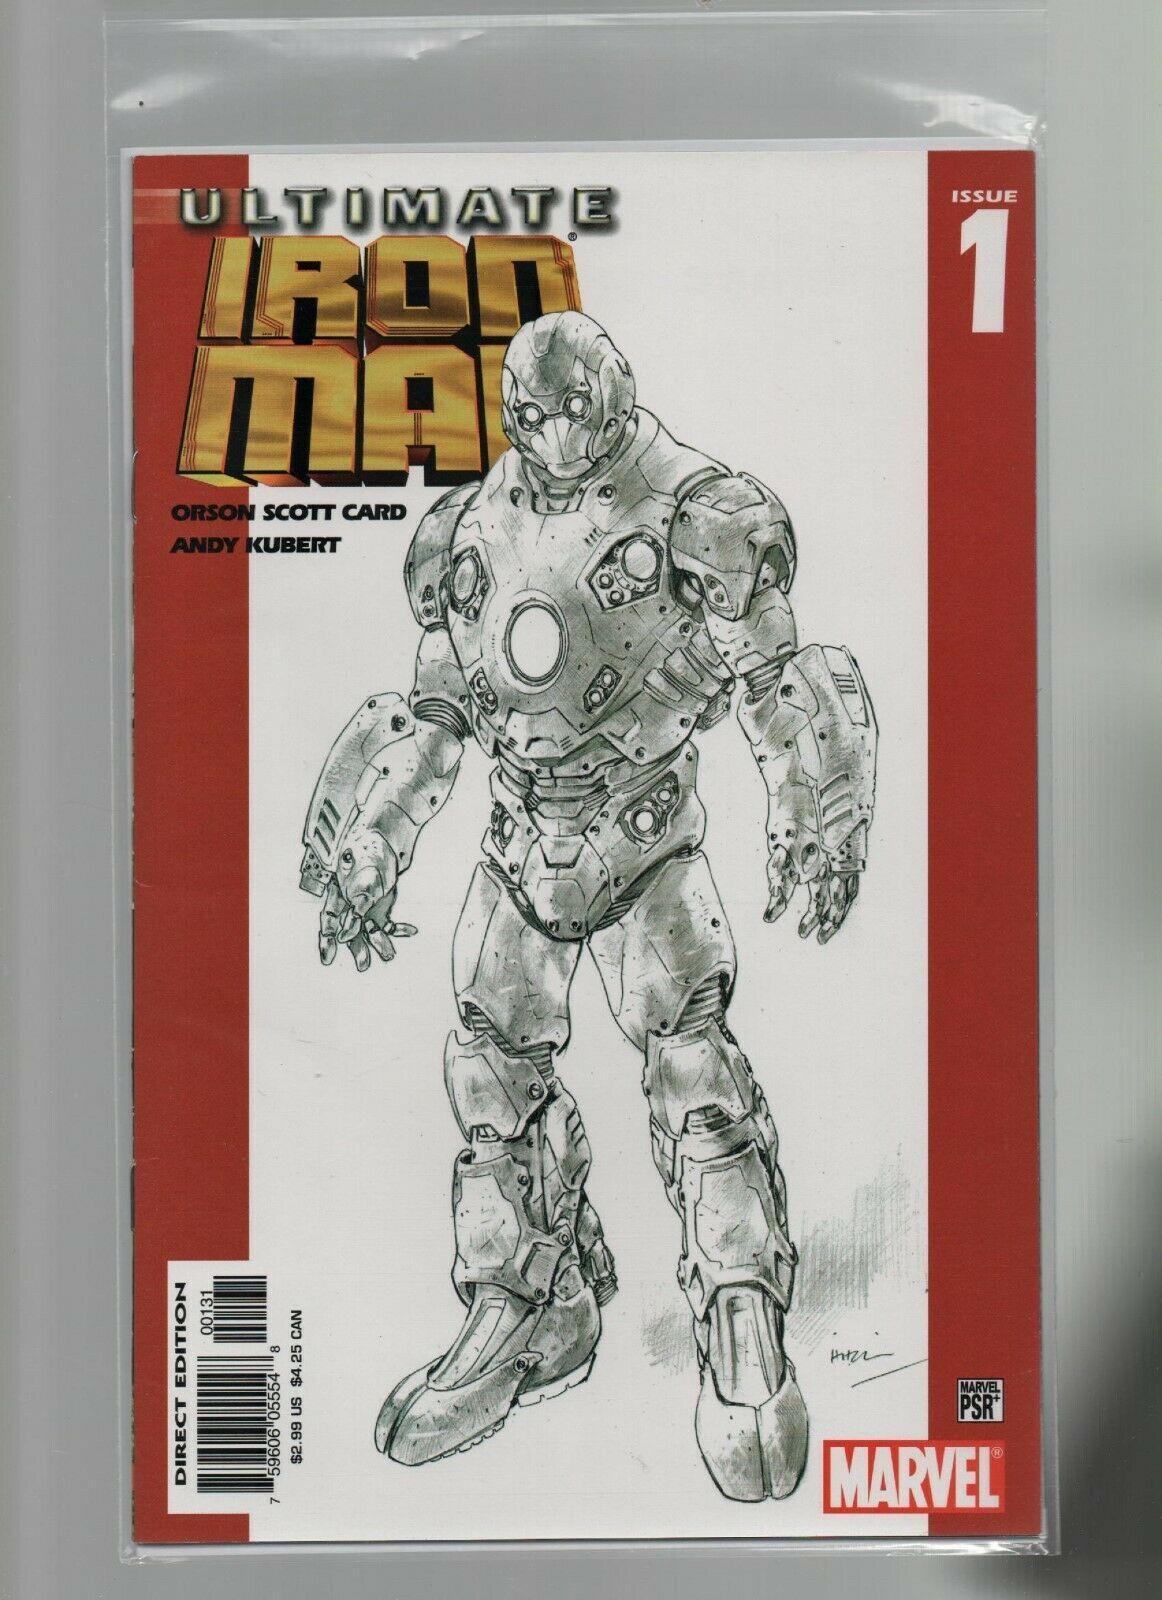 Ultimate Iron Man #1REP.2ND - Marvel Comics - 2005 Orson Scott Card, Andy Kubert